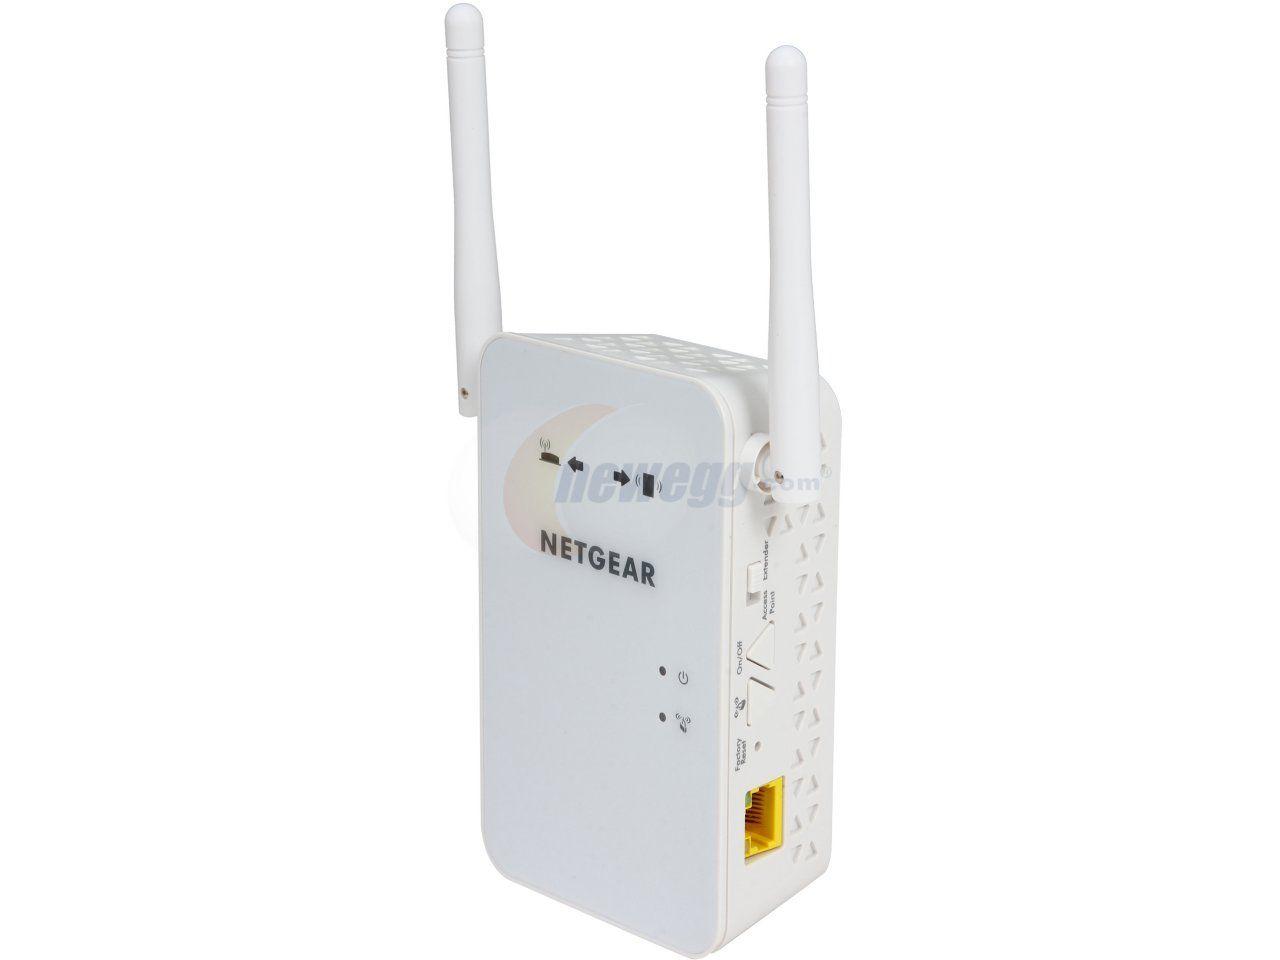 NETGEAR EX6100-100NAS Wireless AC750 Dual-Band Gigabit Range Extender - Newegg.com